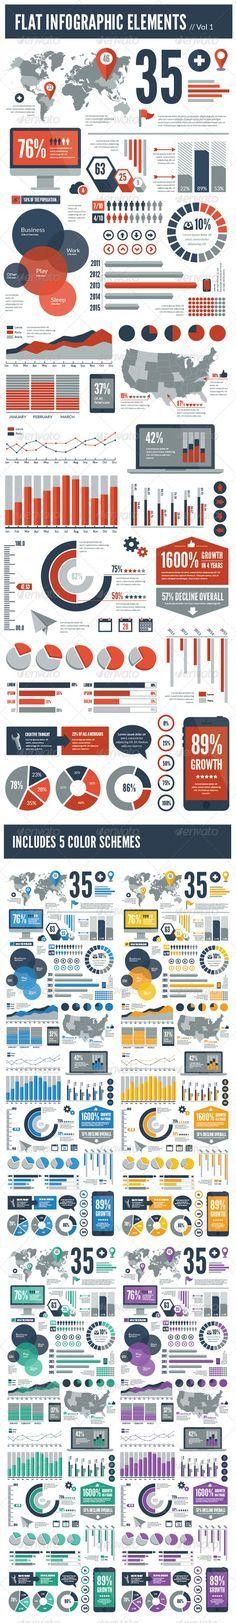 Flat Vector Infographic Elements - Infographics